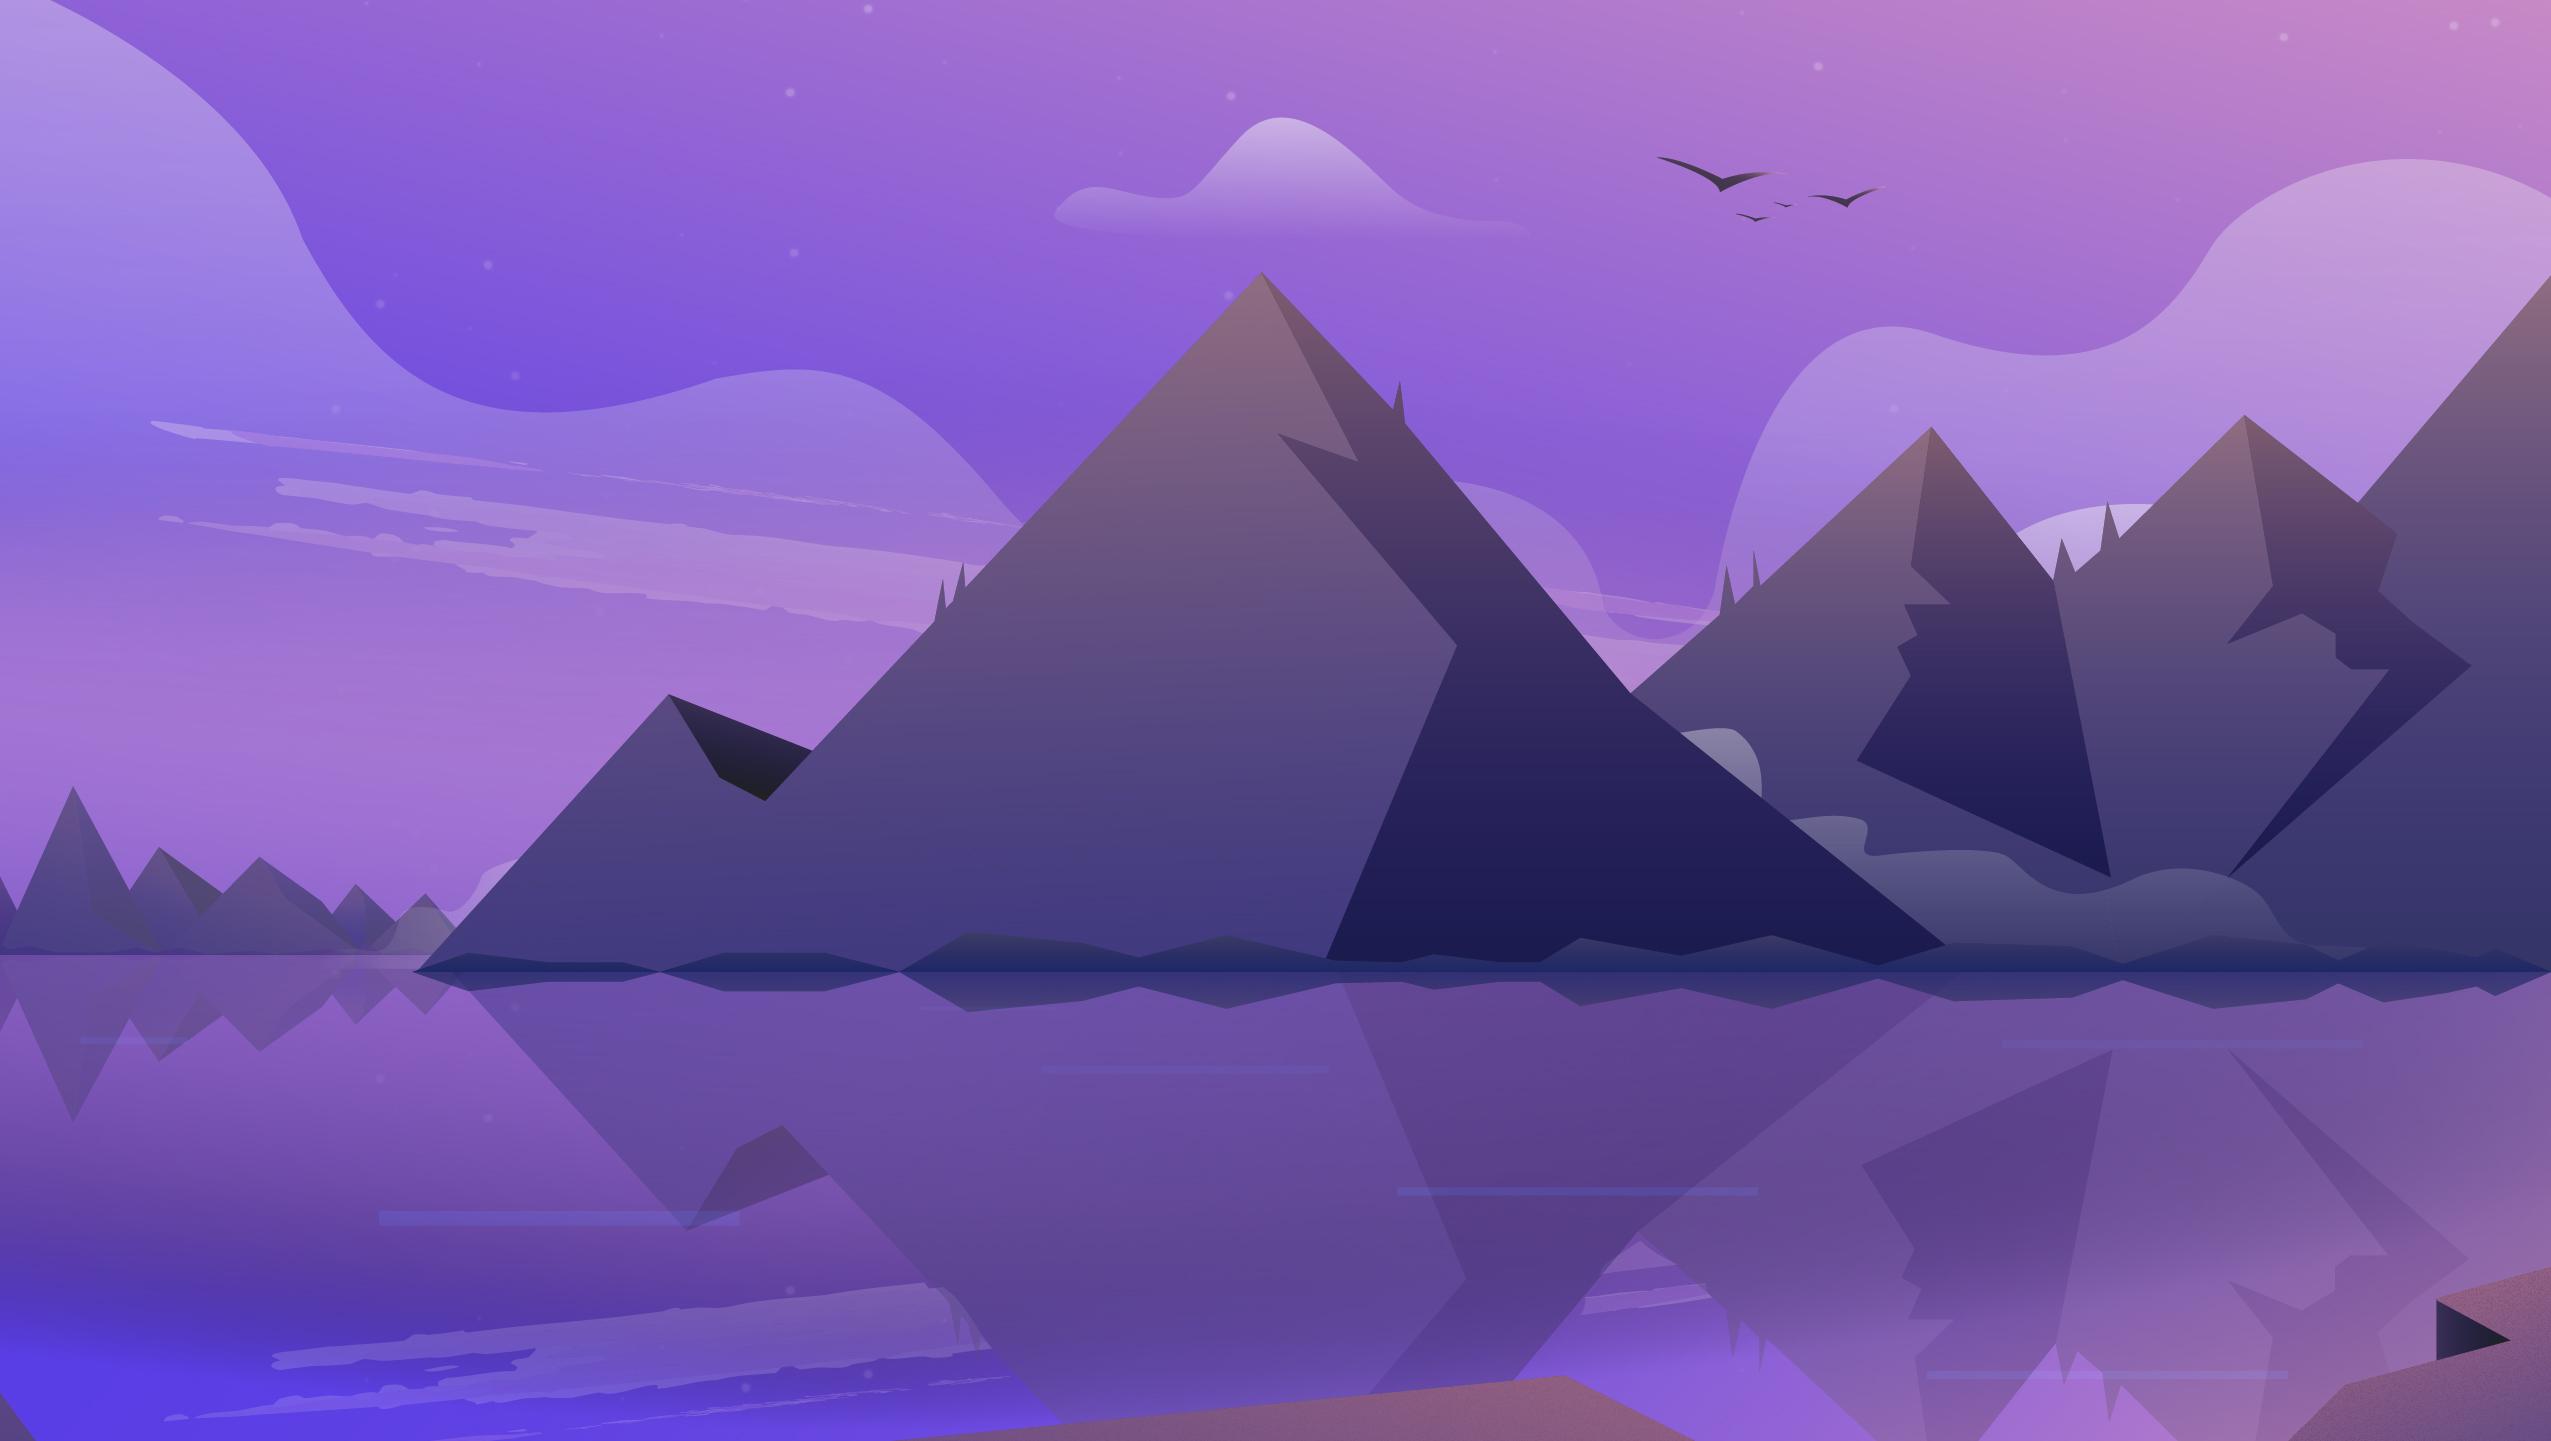 Mountain Landscape Illustration Hd Artist 4k Wallpapers